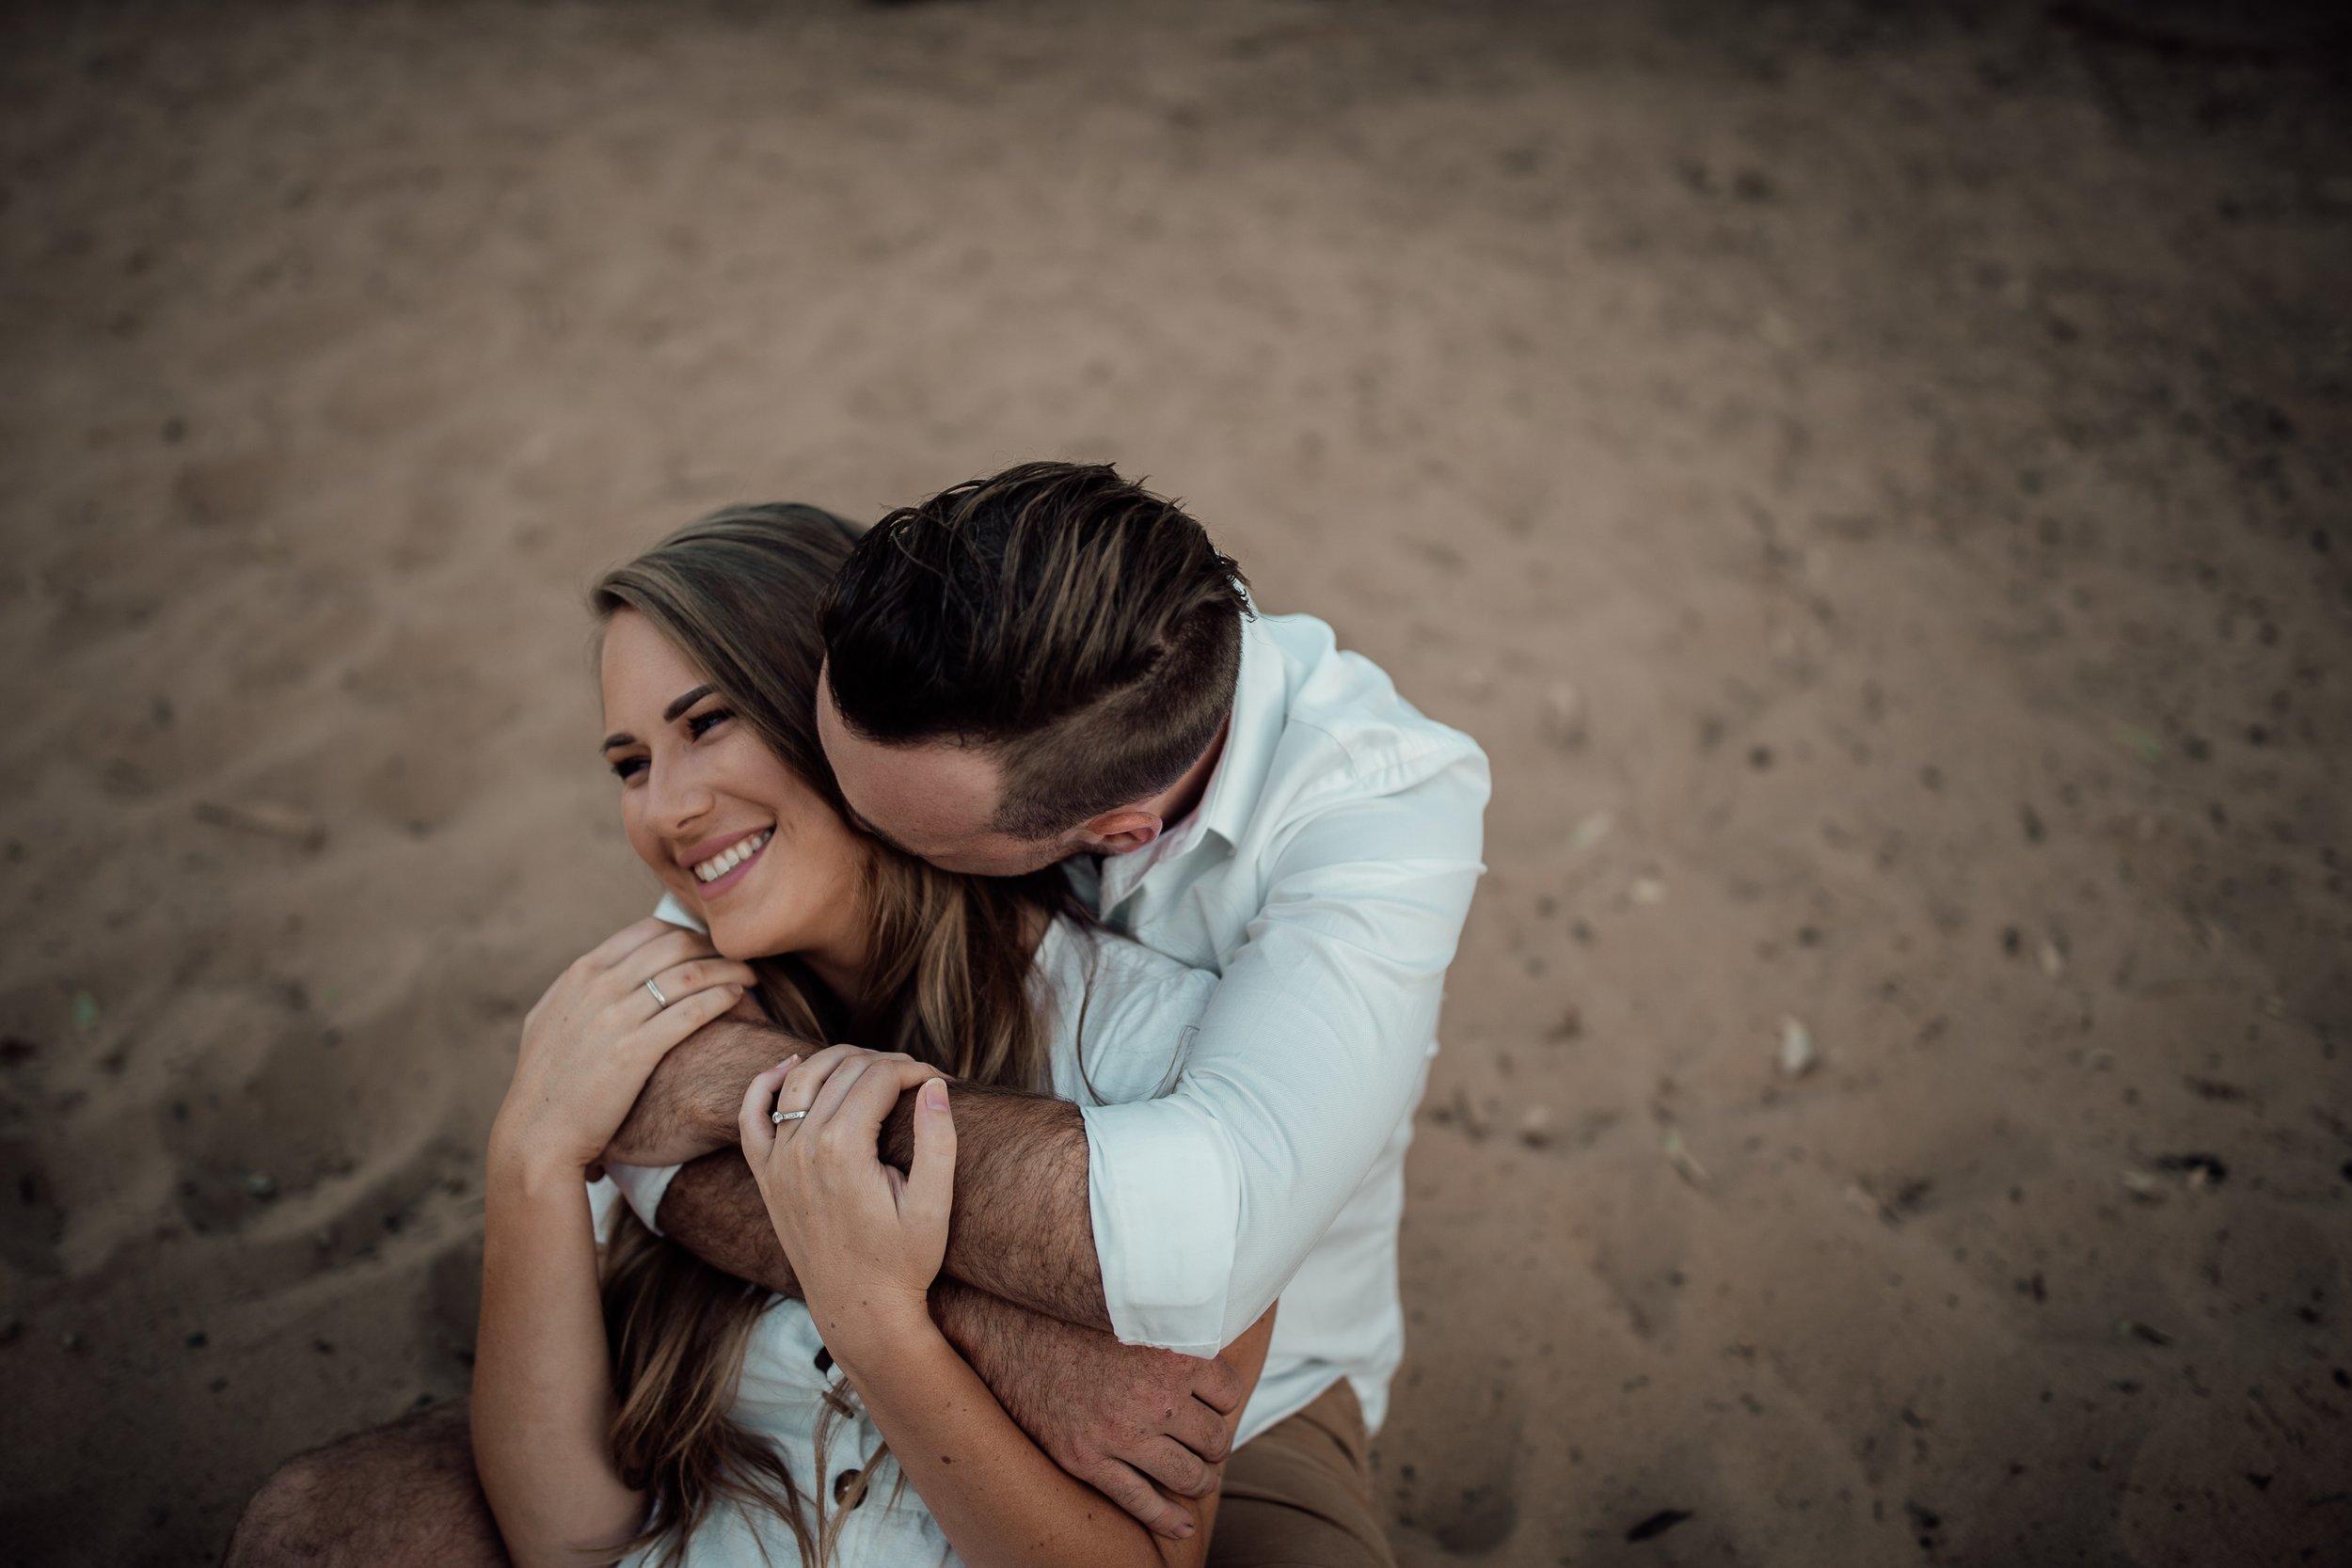 mickalathomas_puremacphotography_weddingphotographer_couplephotographer_Sheppartonphotographer_2858.jpg